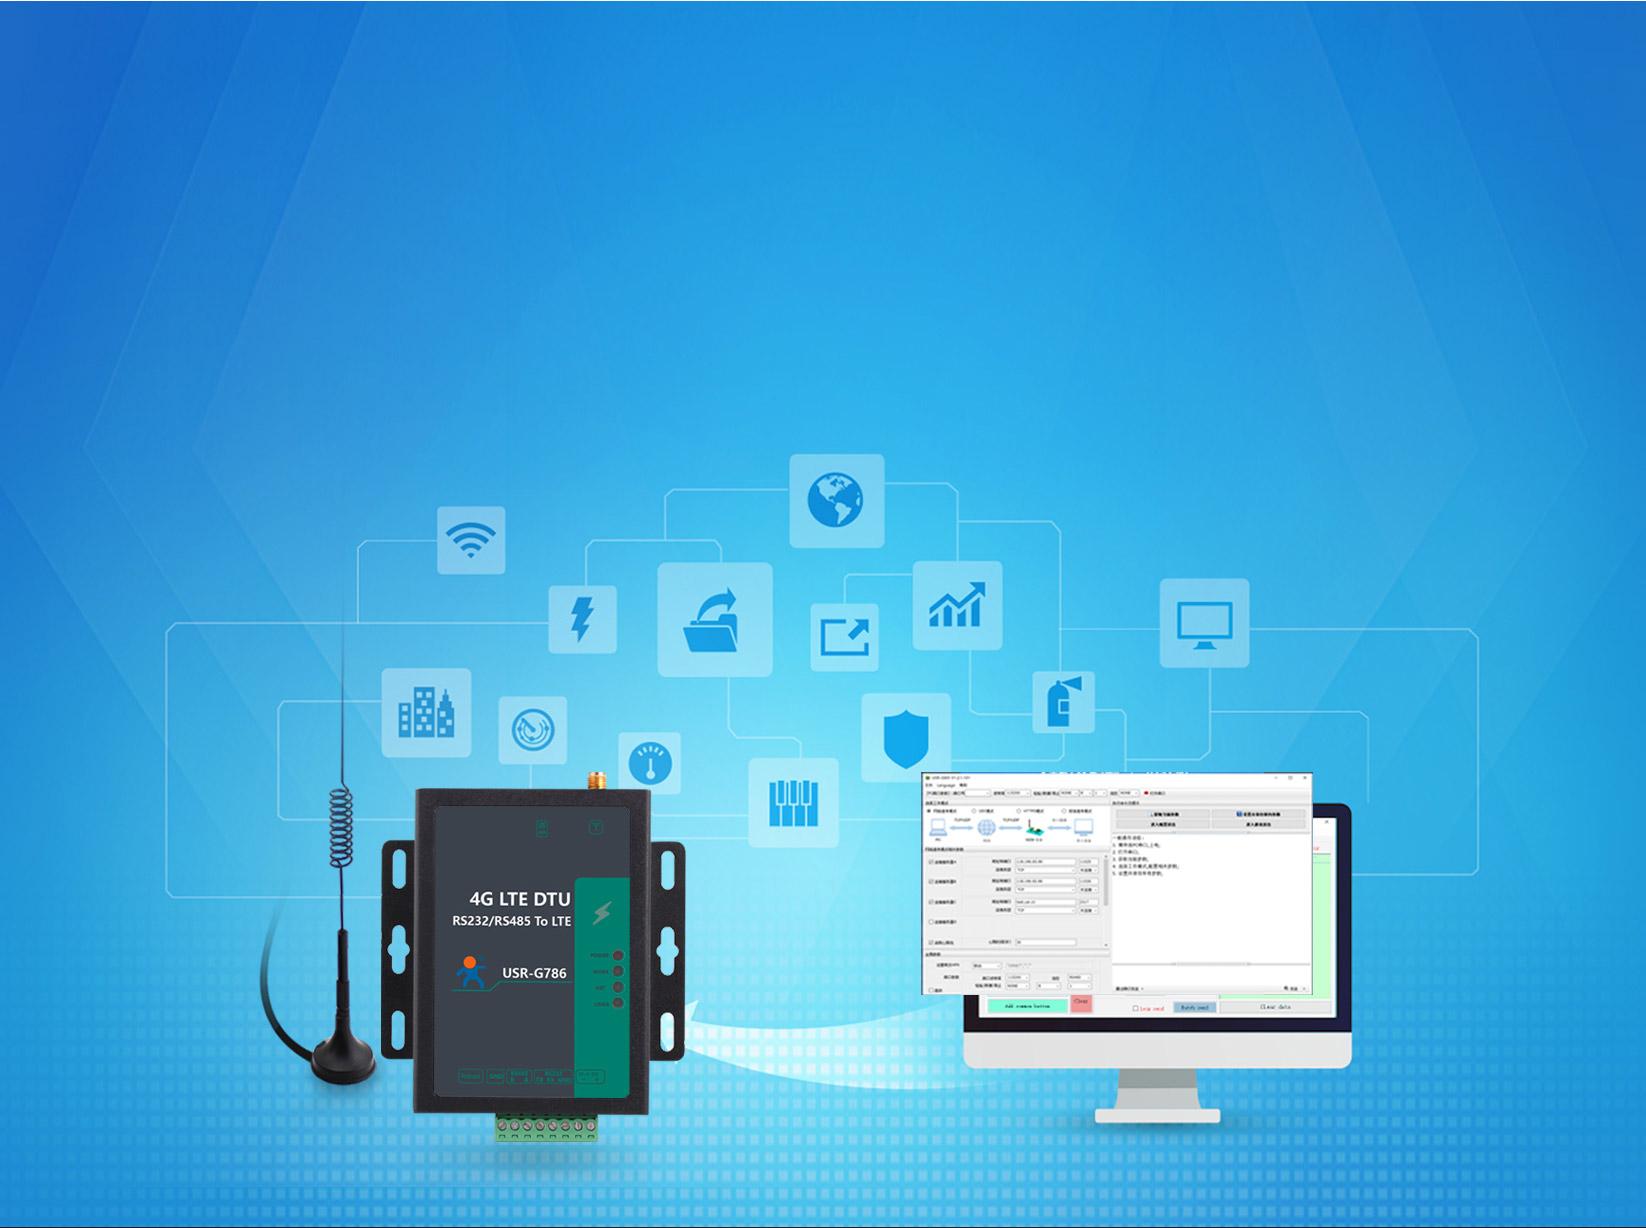 Cellular 4G LTE Modem USR-G786-E: Parameter Configuration